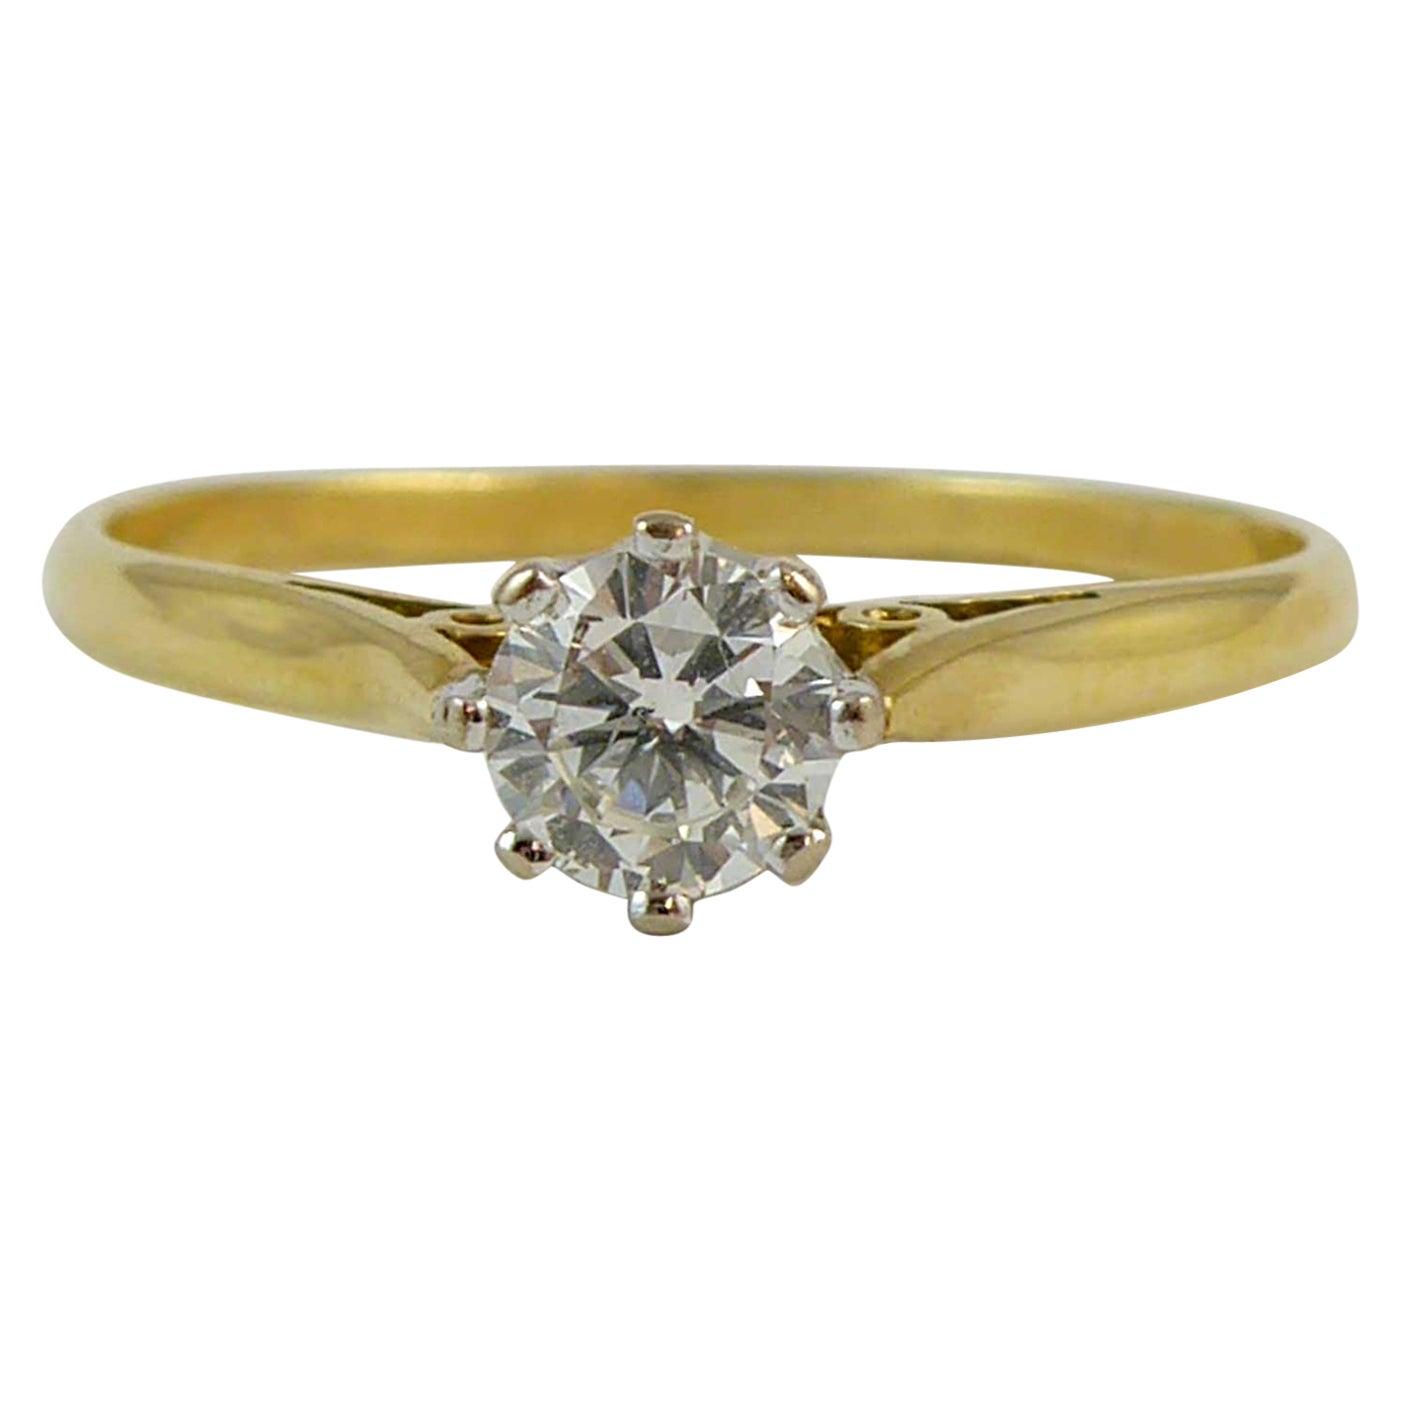 Vintage 0.25 Carat Diamond Solitaire Ring, Hallmarked 1989, Birmingham